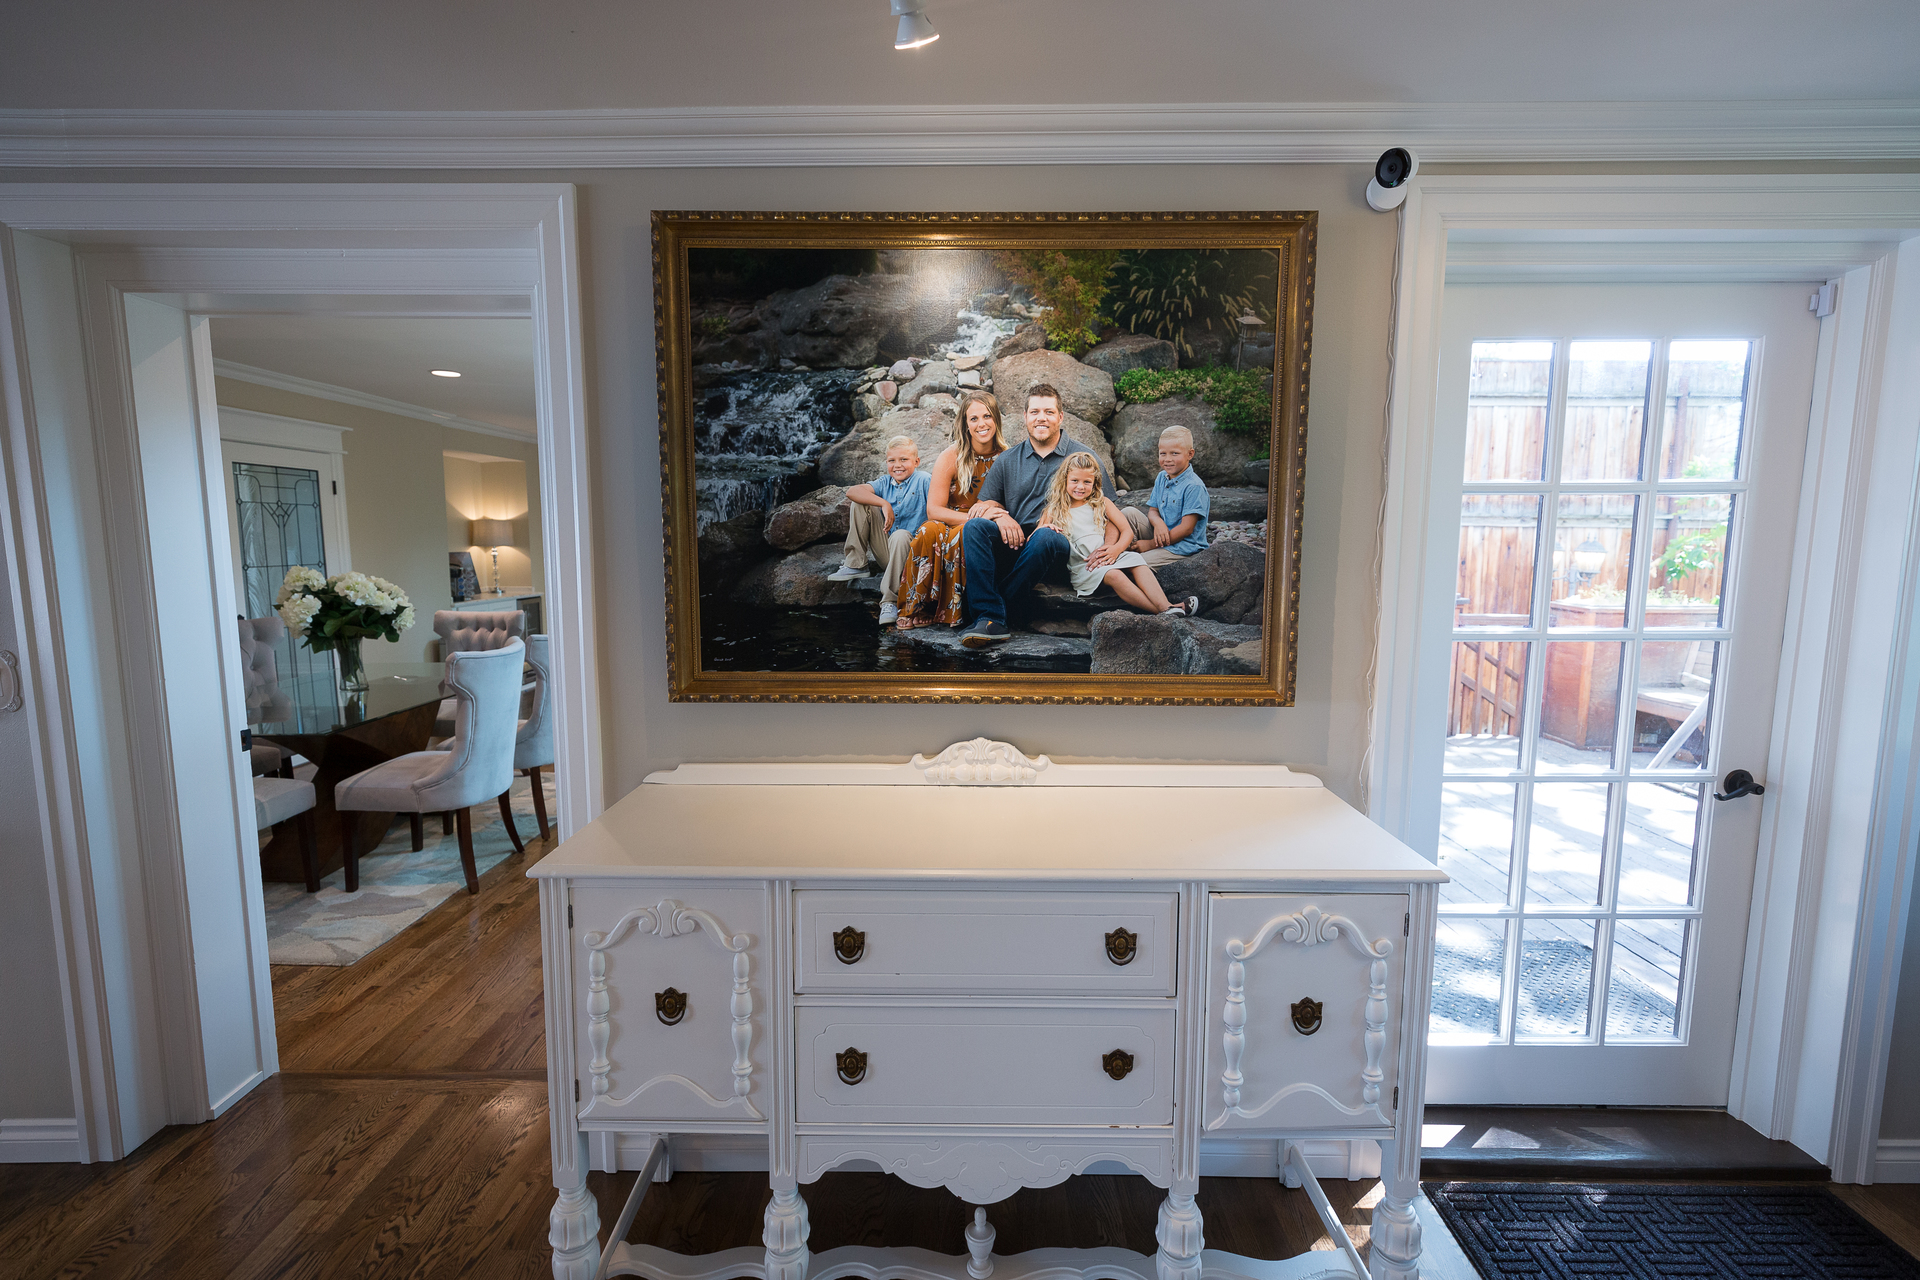 framed picture of smiling family in foyer